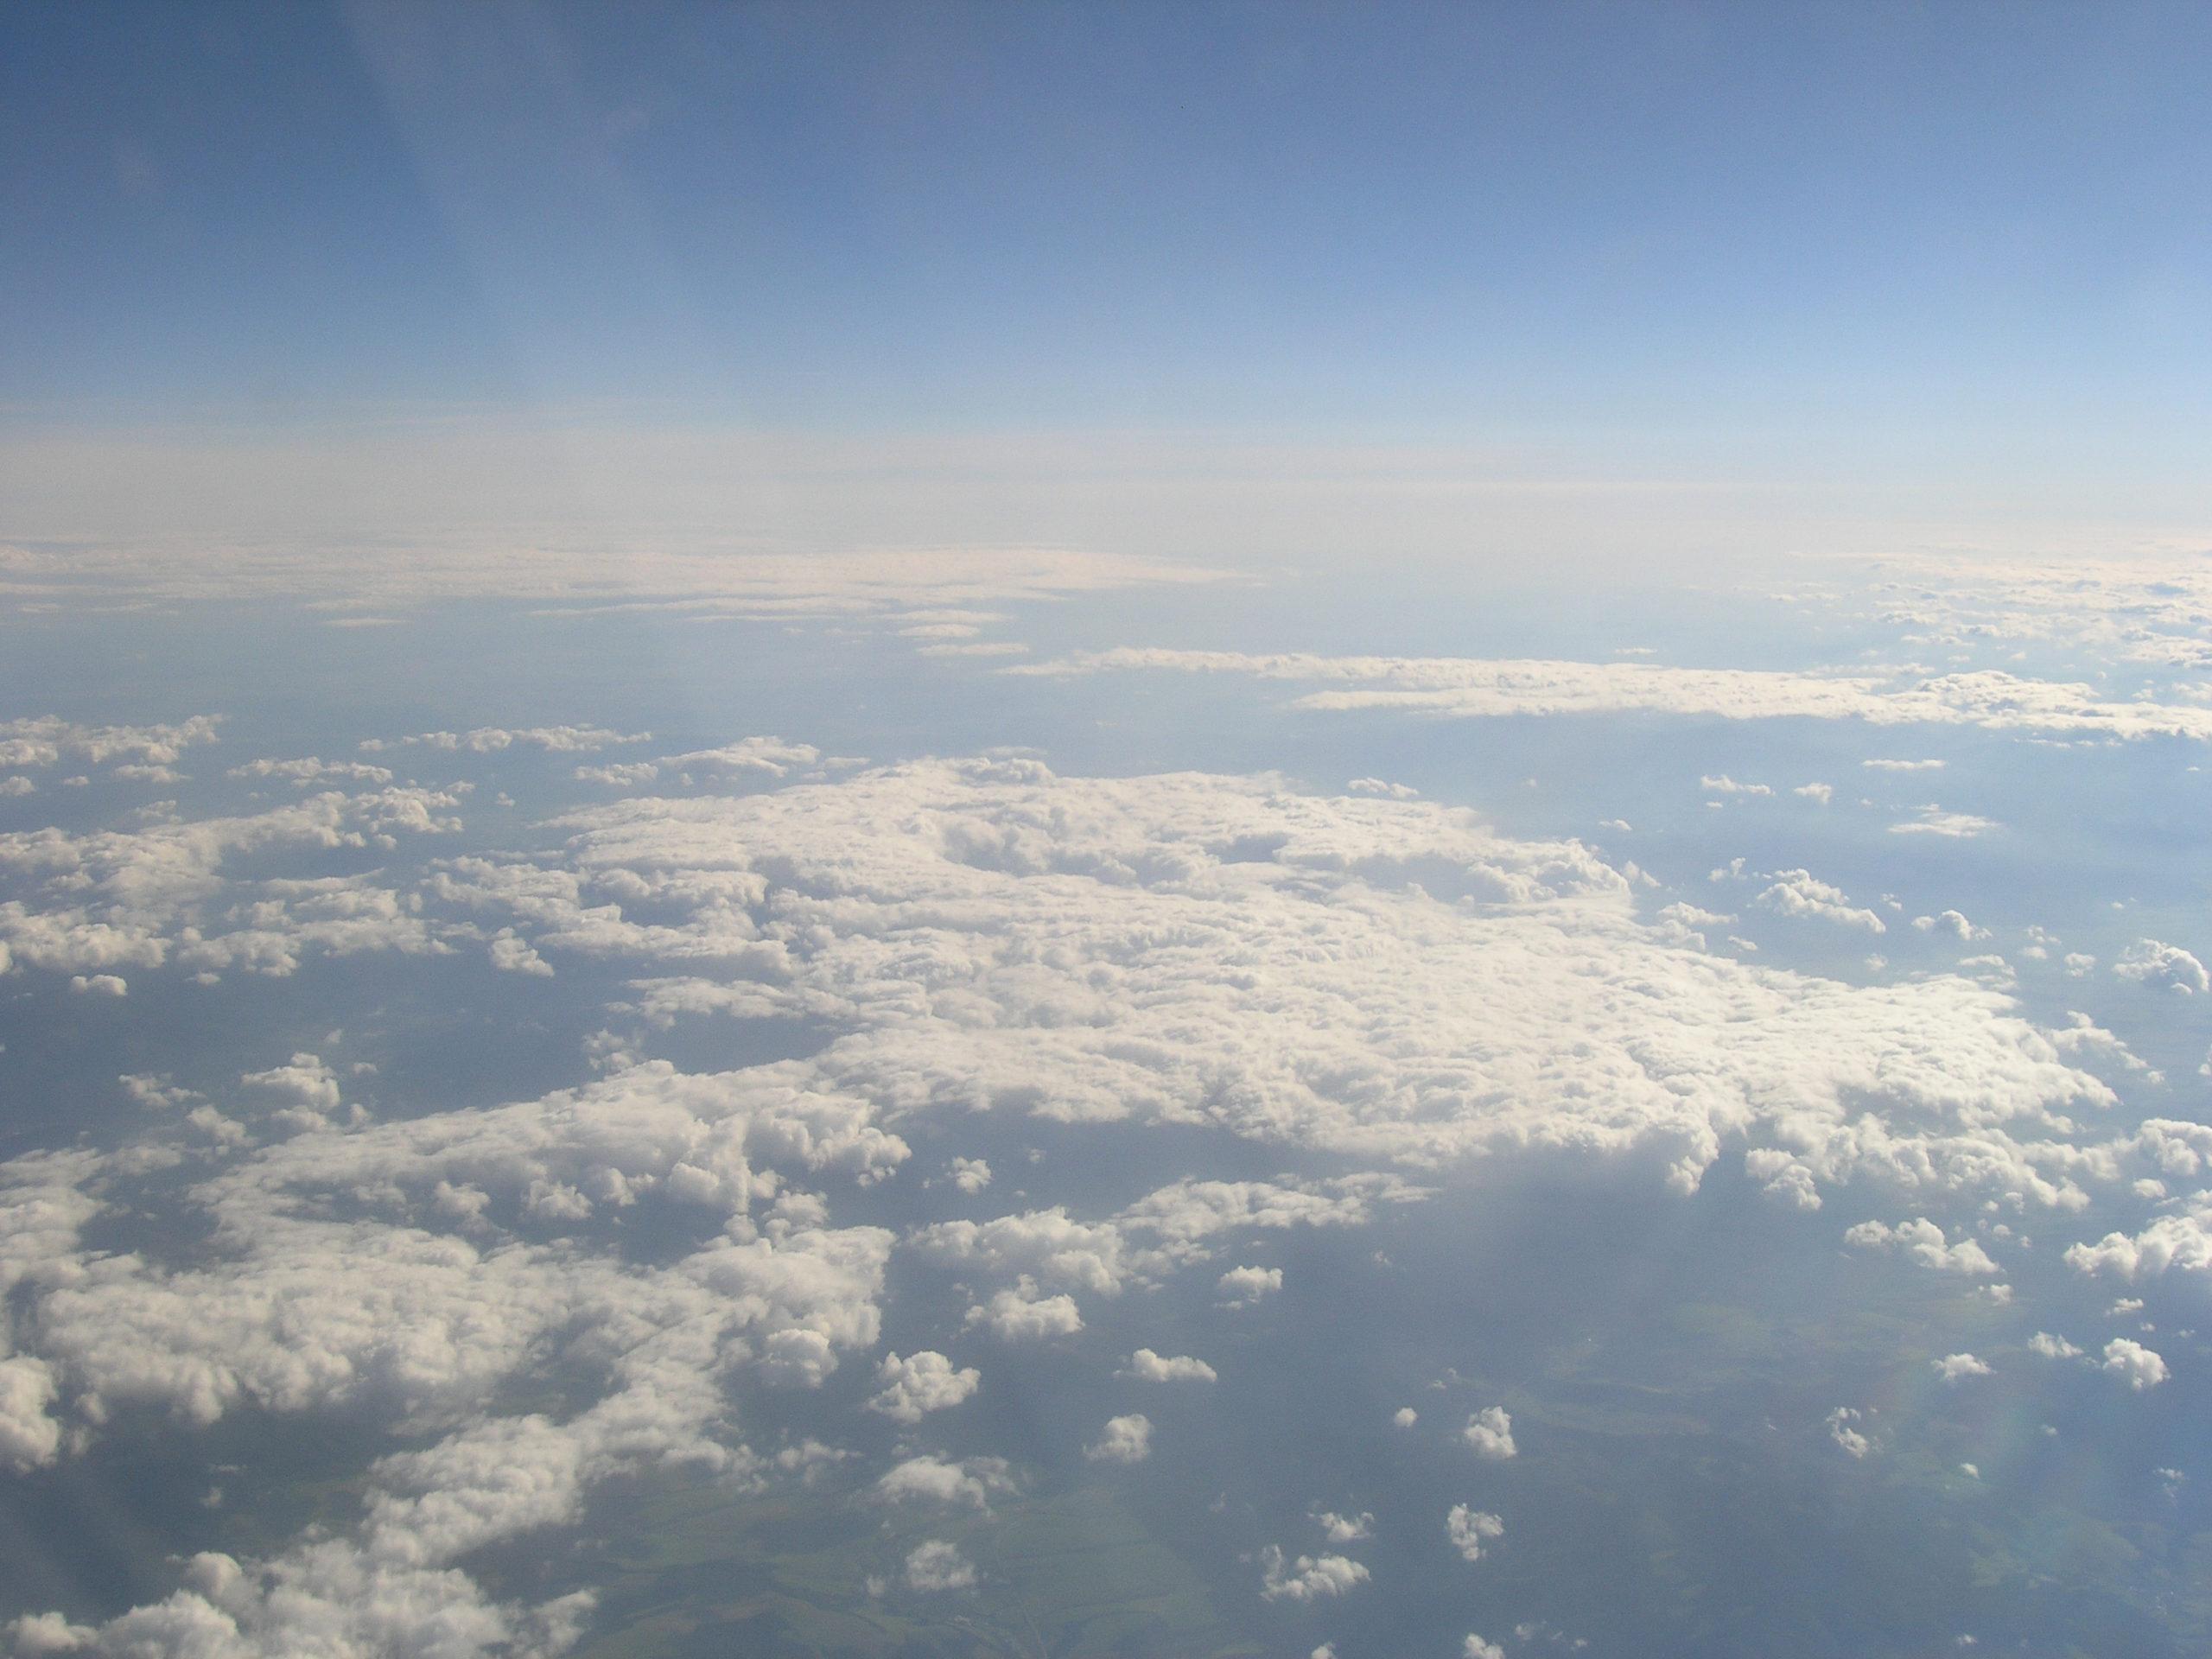 Widok na chmury z samolotu